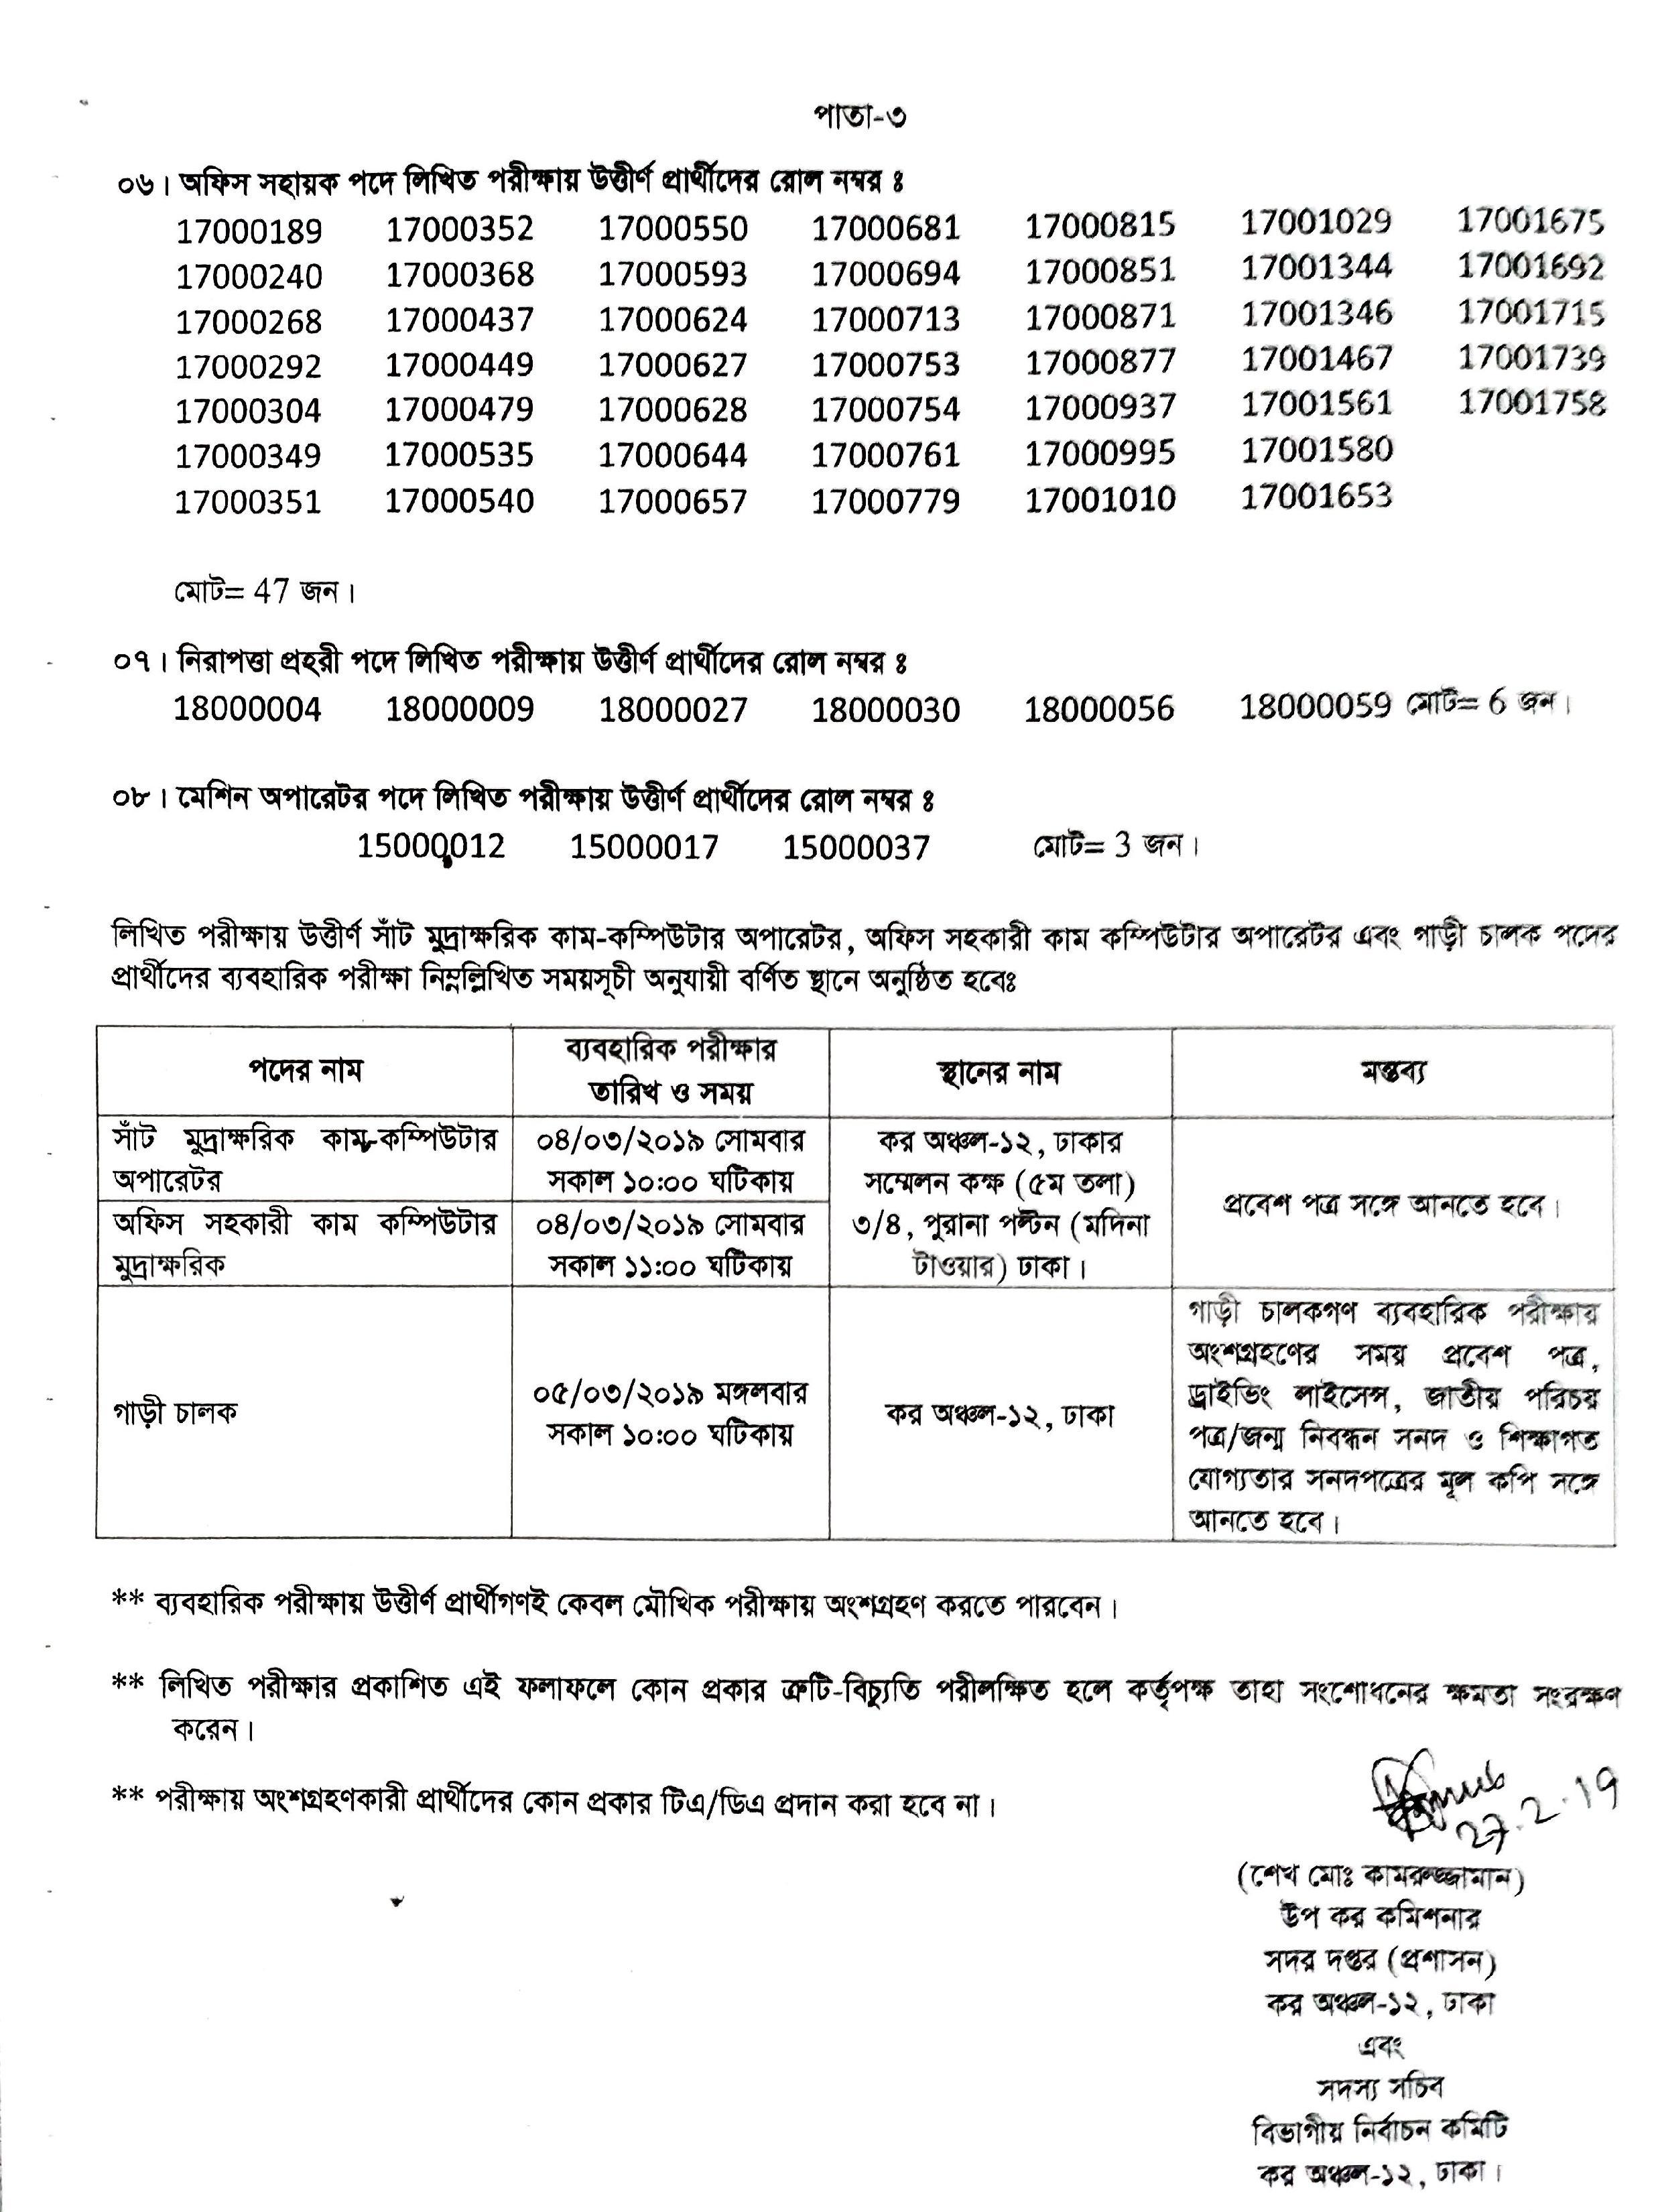 Taxes Zone-12 Dhaka Exam Result 2019, Taxes Zone-12 Dhaka Job Recruitment Exam 22 February Result 2019, Job Test Results, কর অঞ্চল-১২, ঢাকা পরীক্ষার রেজাল্ট